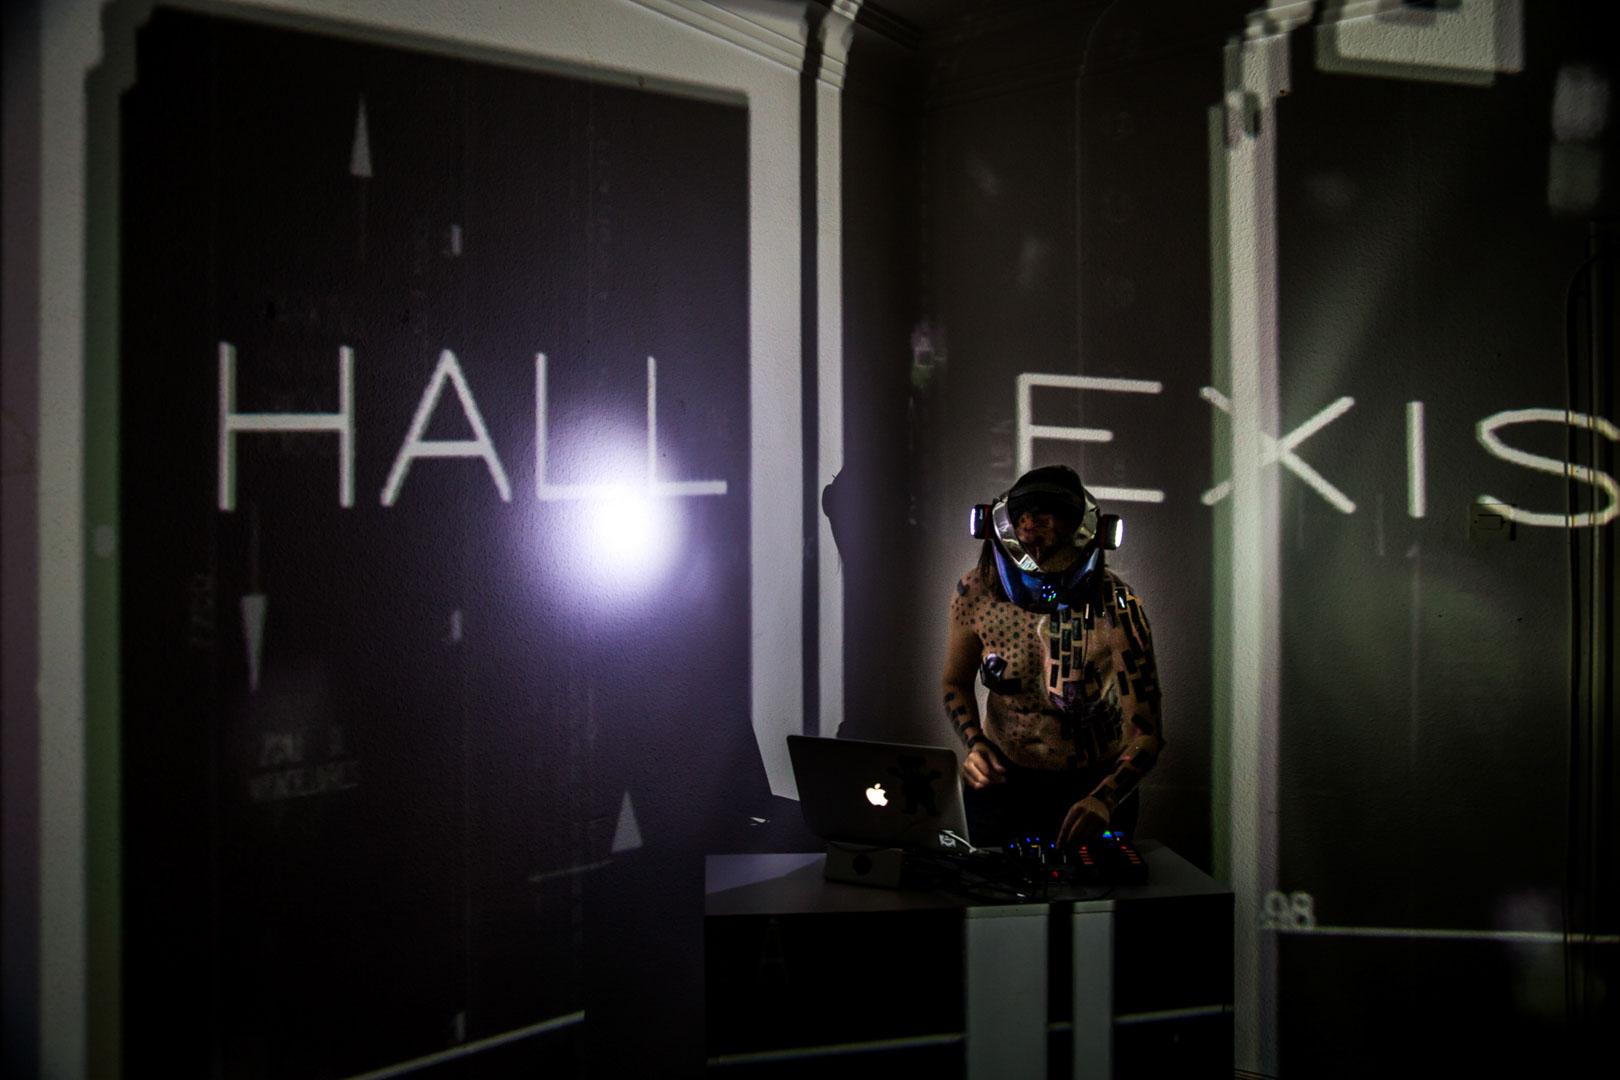 Visuales Nidra Eternity immersive projections mapping vj Christel Bocksang